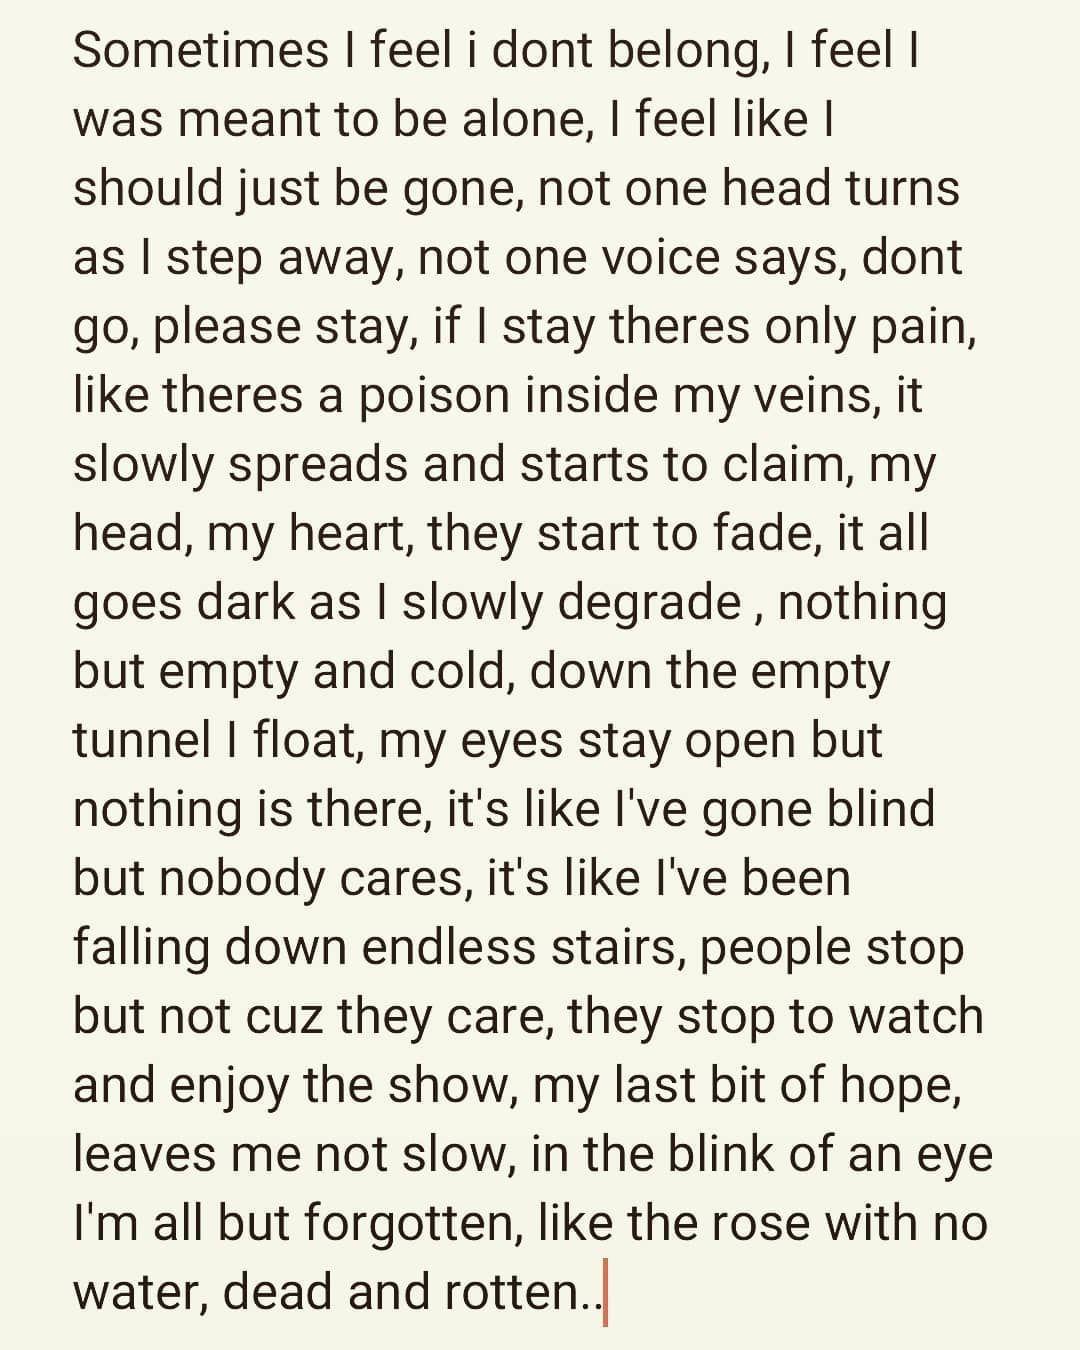 #randompoetry #poems #poem #feelings #feels #pain #randomthoughts #writing #poet #poetry #expression #expressing #nighttimevibes #vibes #author #amateur #arts #arte #poemas #dolor #amor #loved #alone #dark #darkestminds